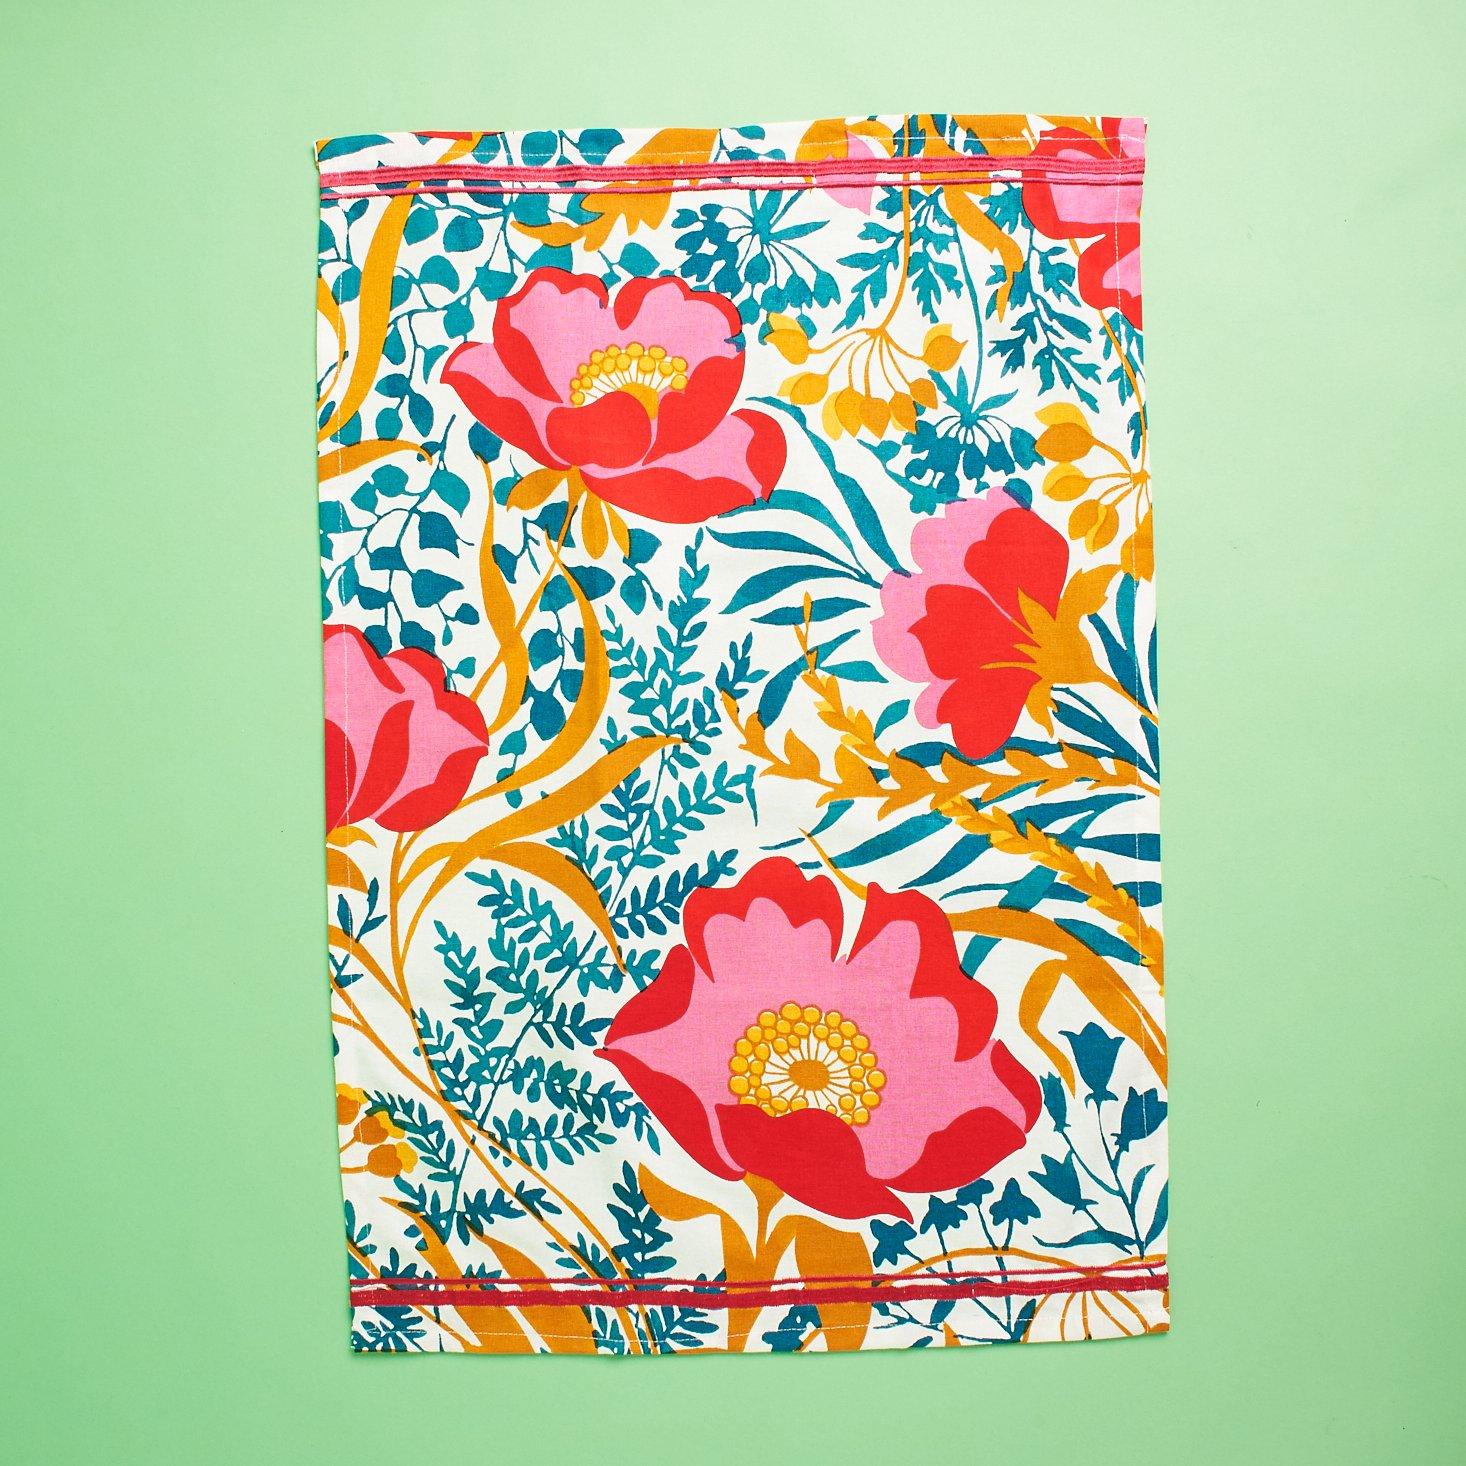 red embroidered seams on tea towel